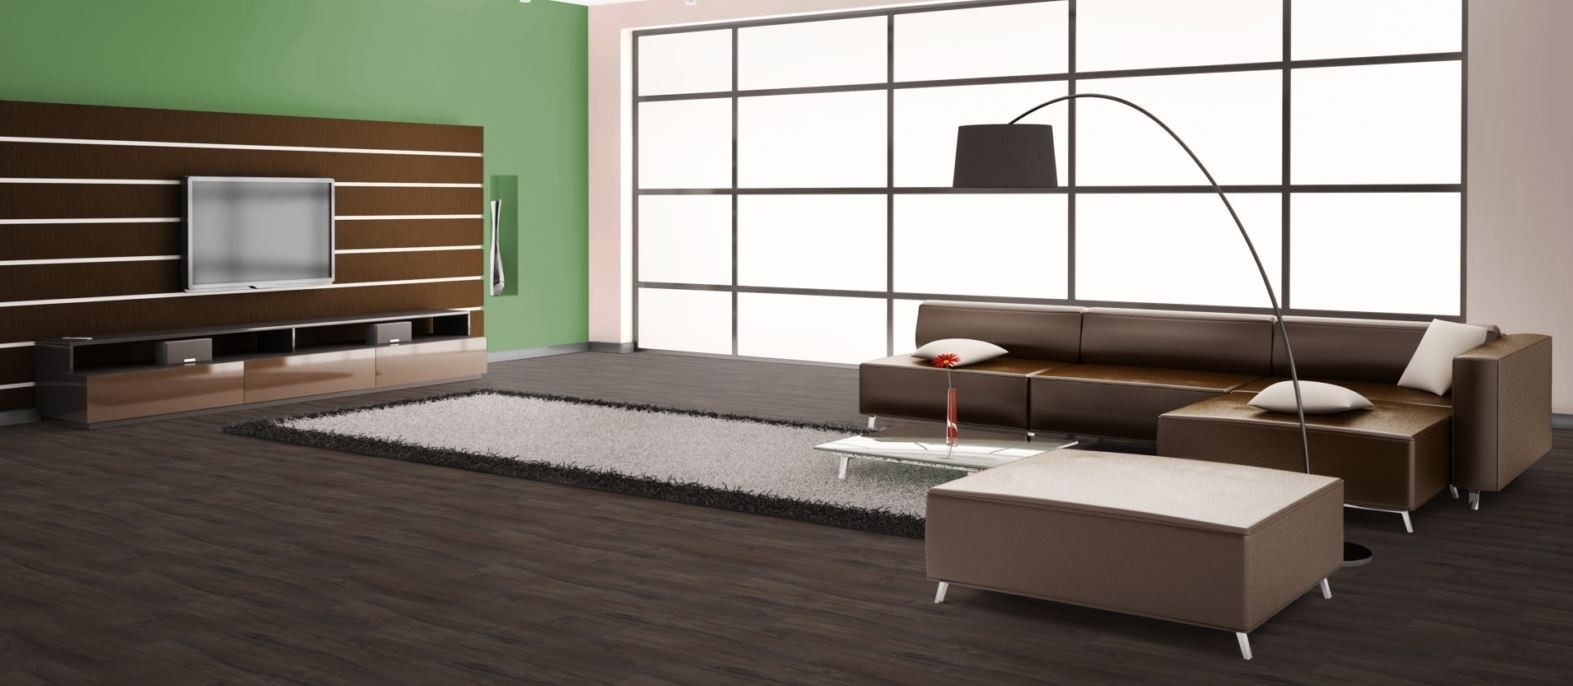 klick vinylboden project eiche schlamm ns 0 5 mm nk 33. Black Bedroom Furniture Sets. Home Design Ideas